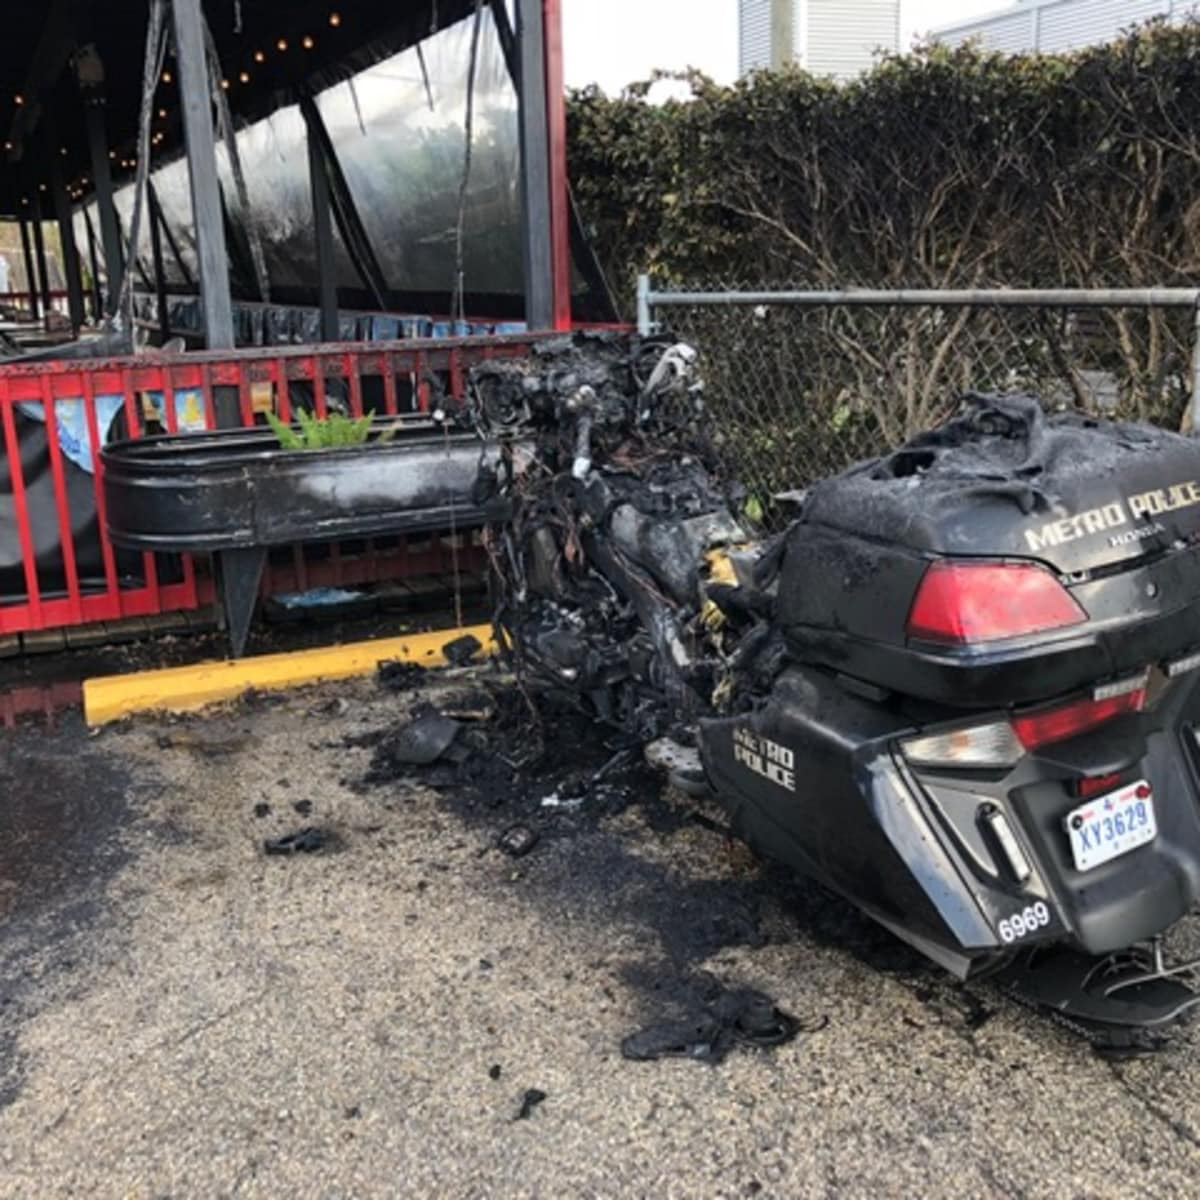 Jax Grill Metro motorcycle fire